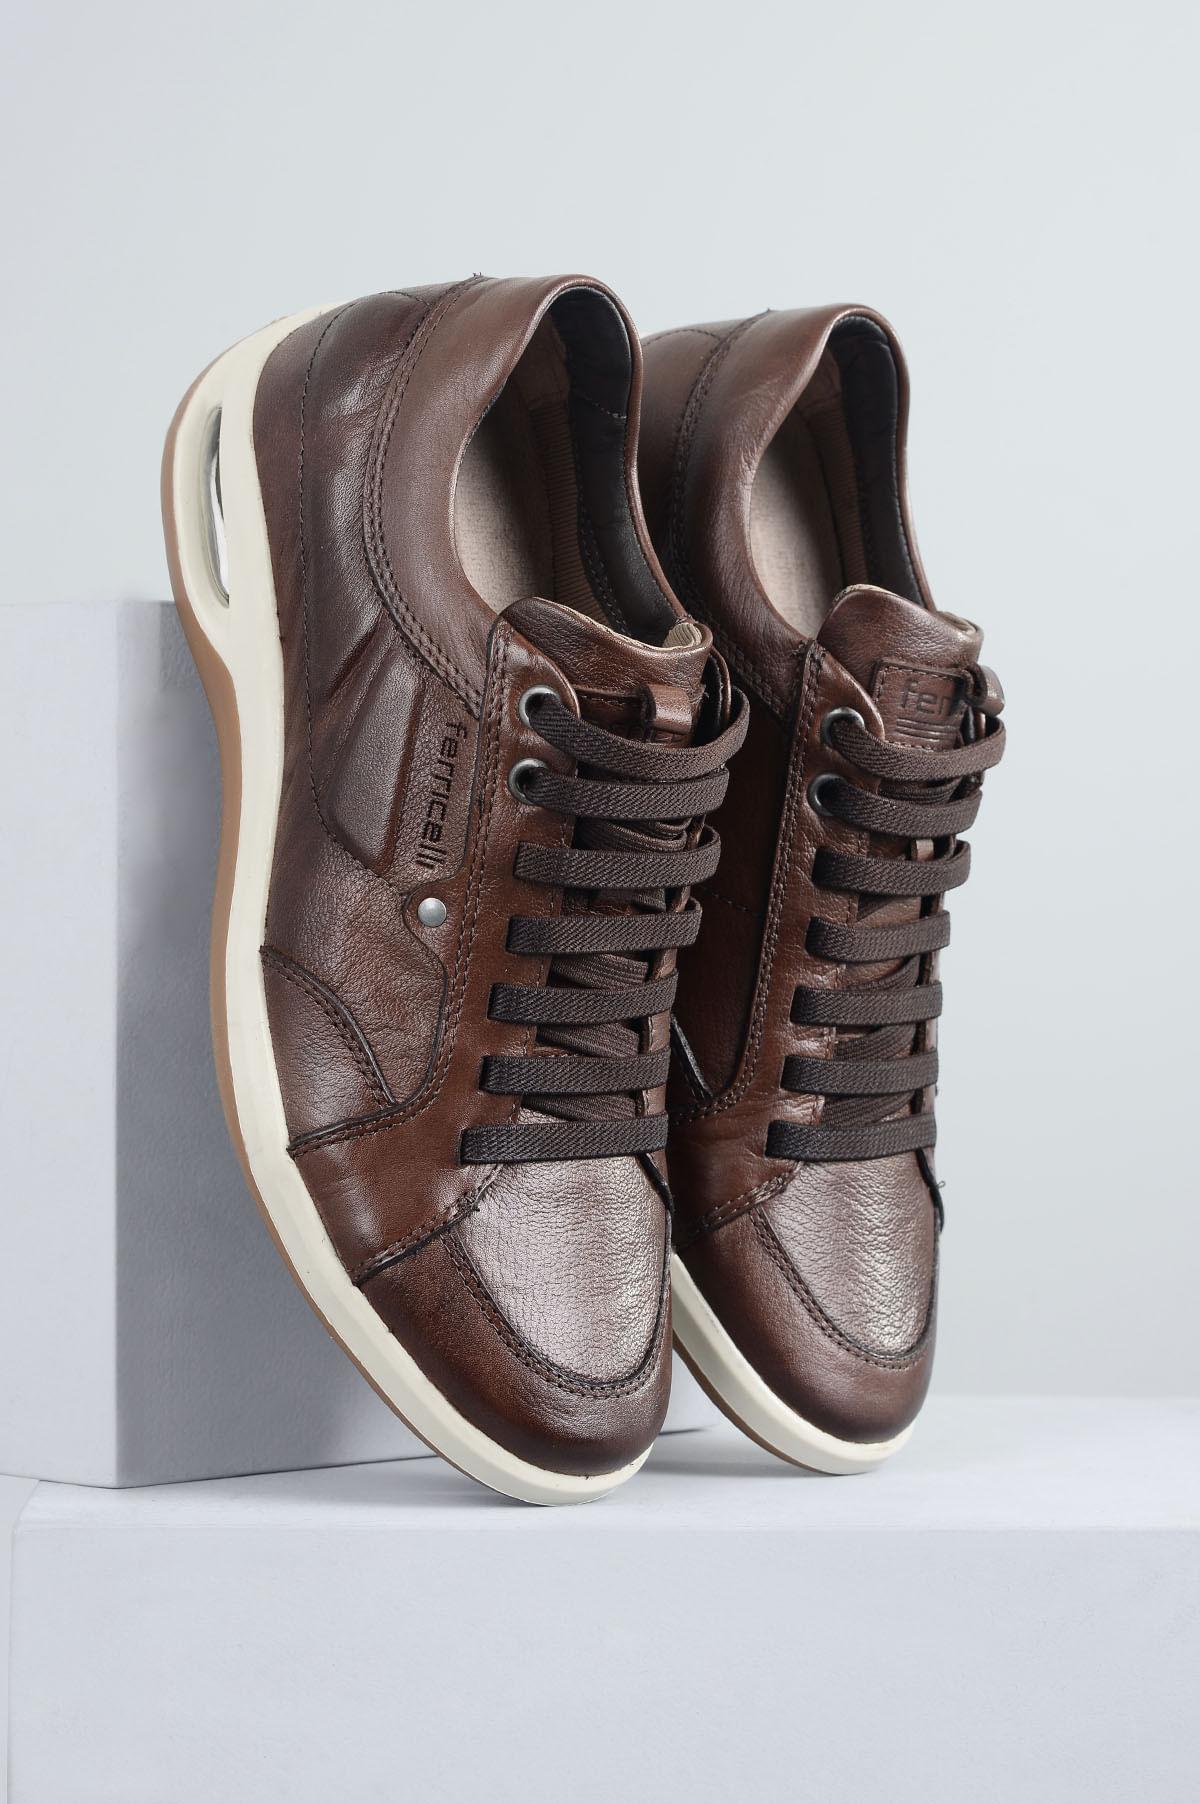 589011f27 Sapatênis Masculino Ferricelli Patrick CR TAN - Mundial Calçados